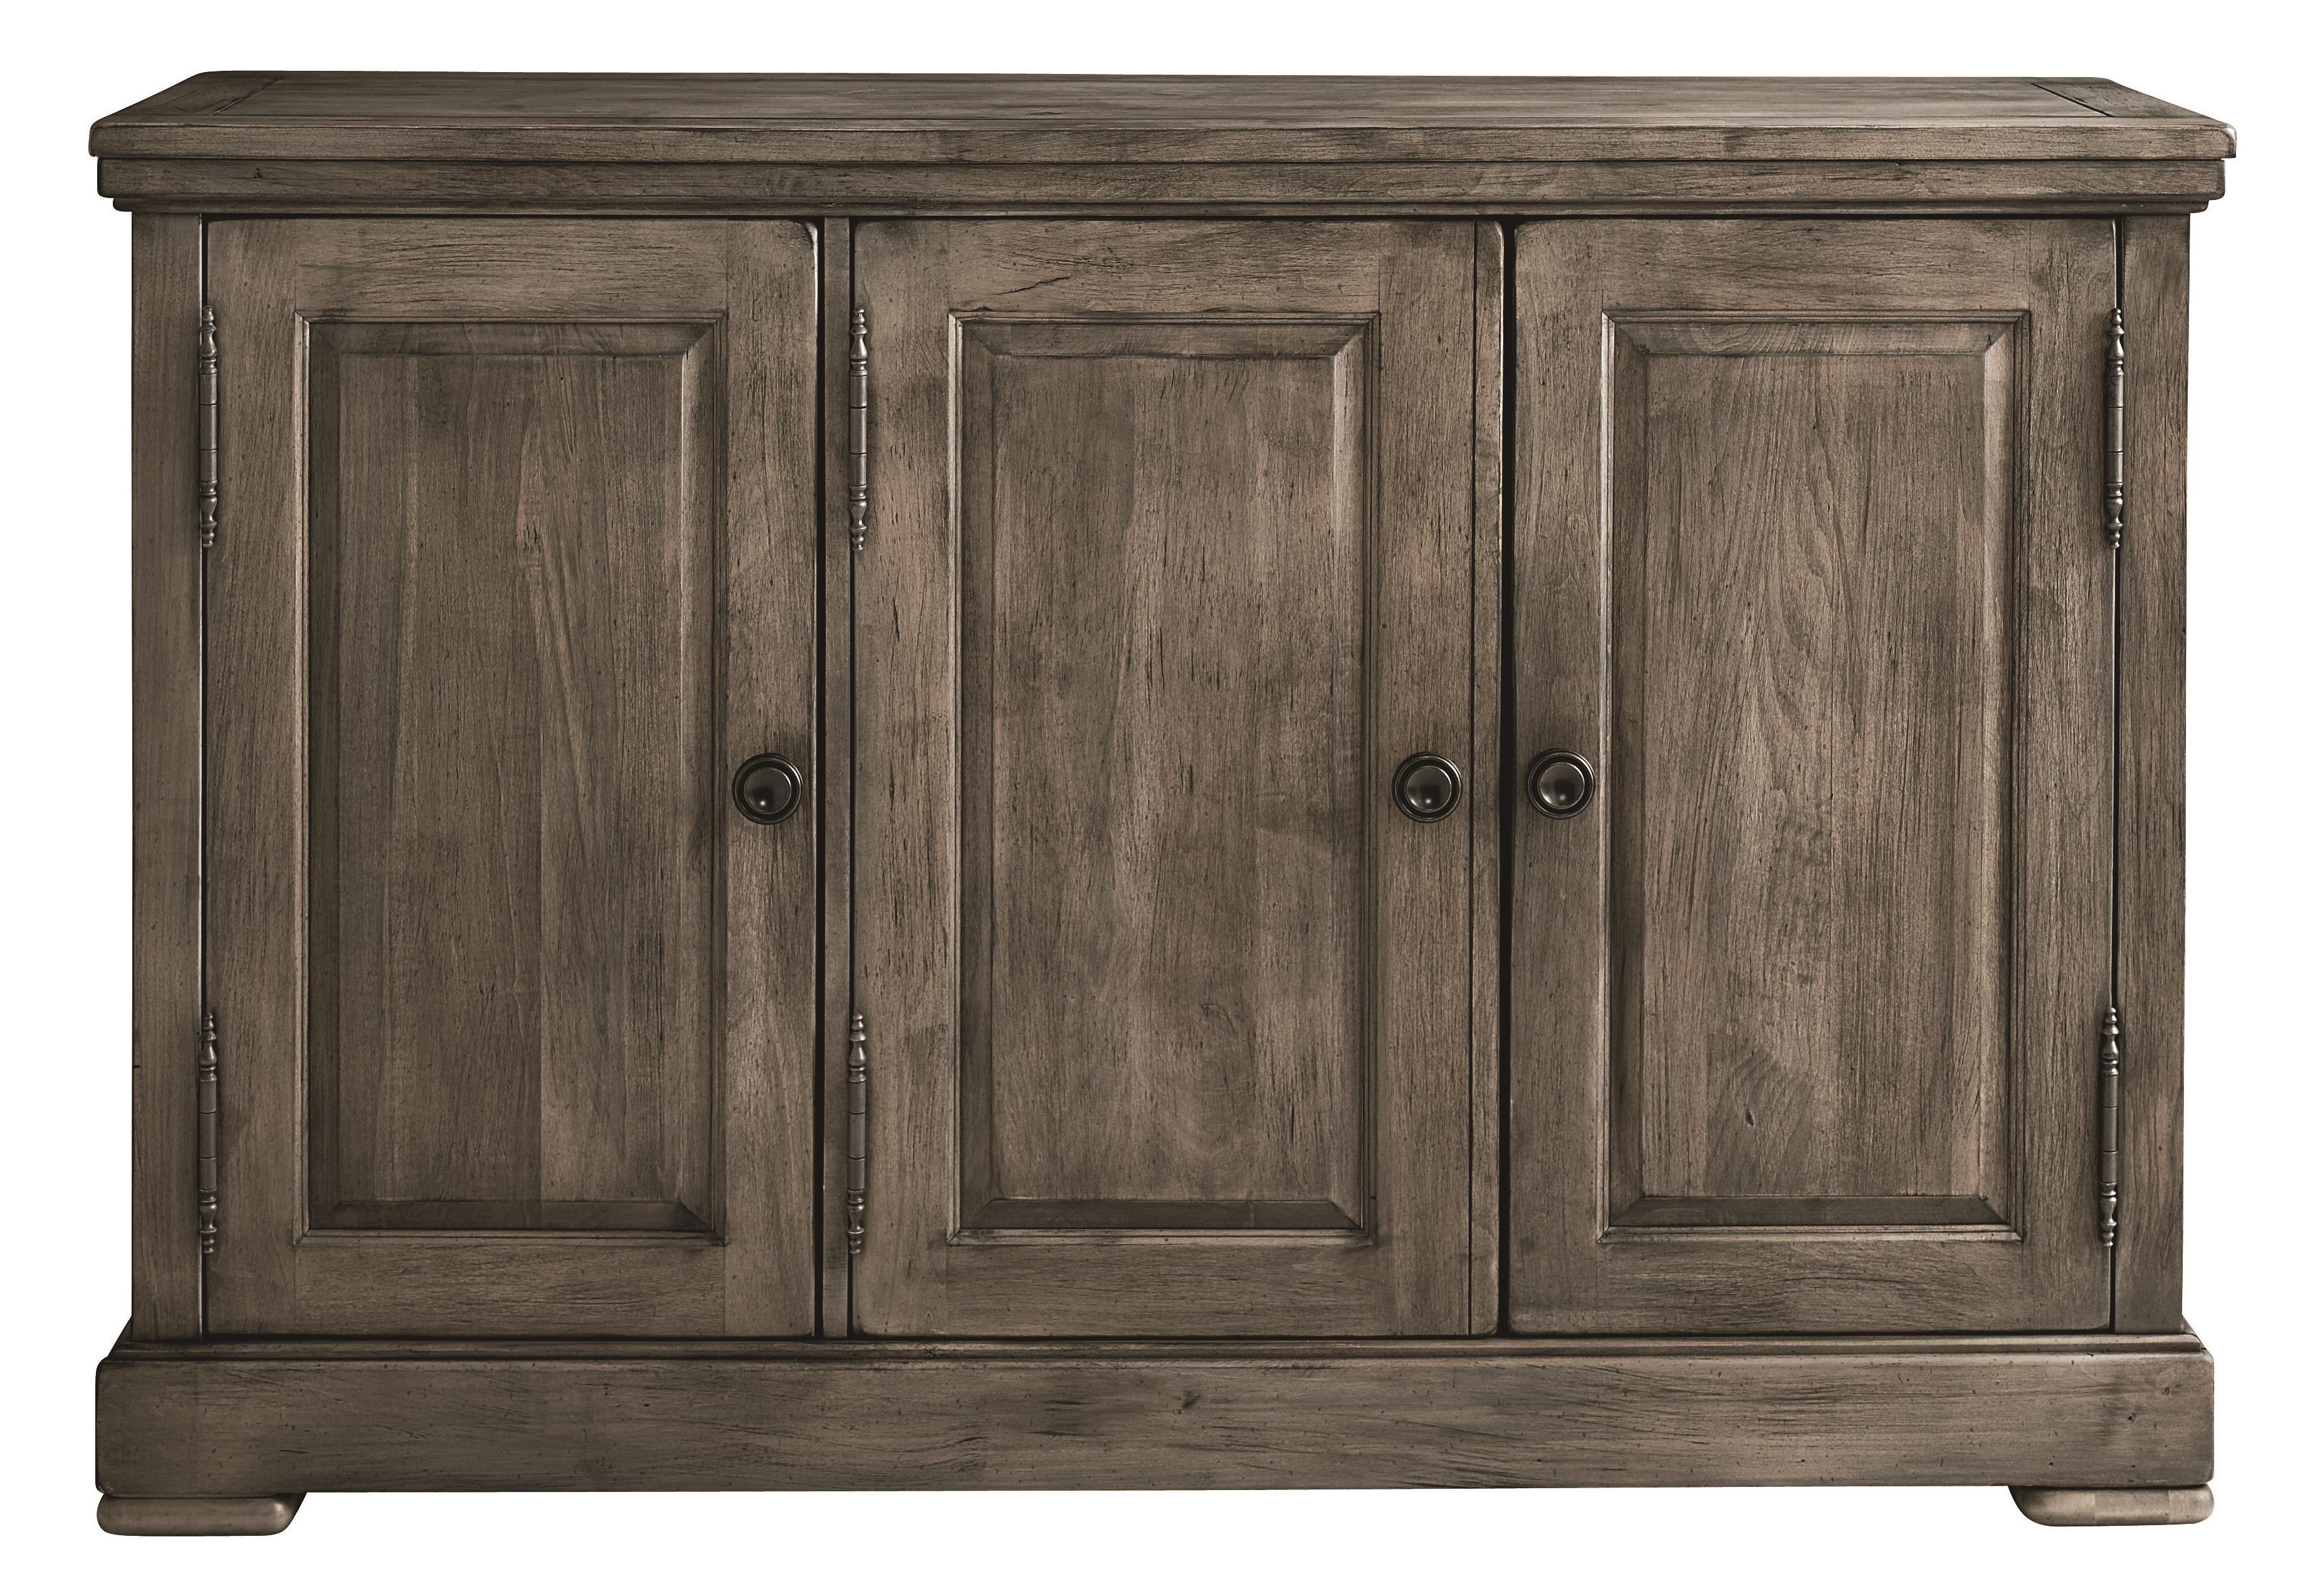 Bench Made Maple Three Door Hawkins Huntboard by Bassett at Bassett of Cool Springs